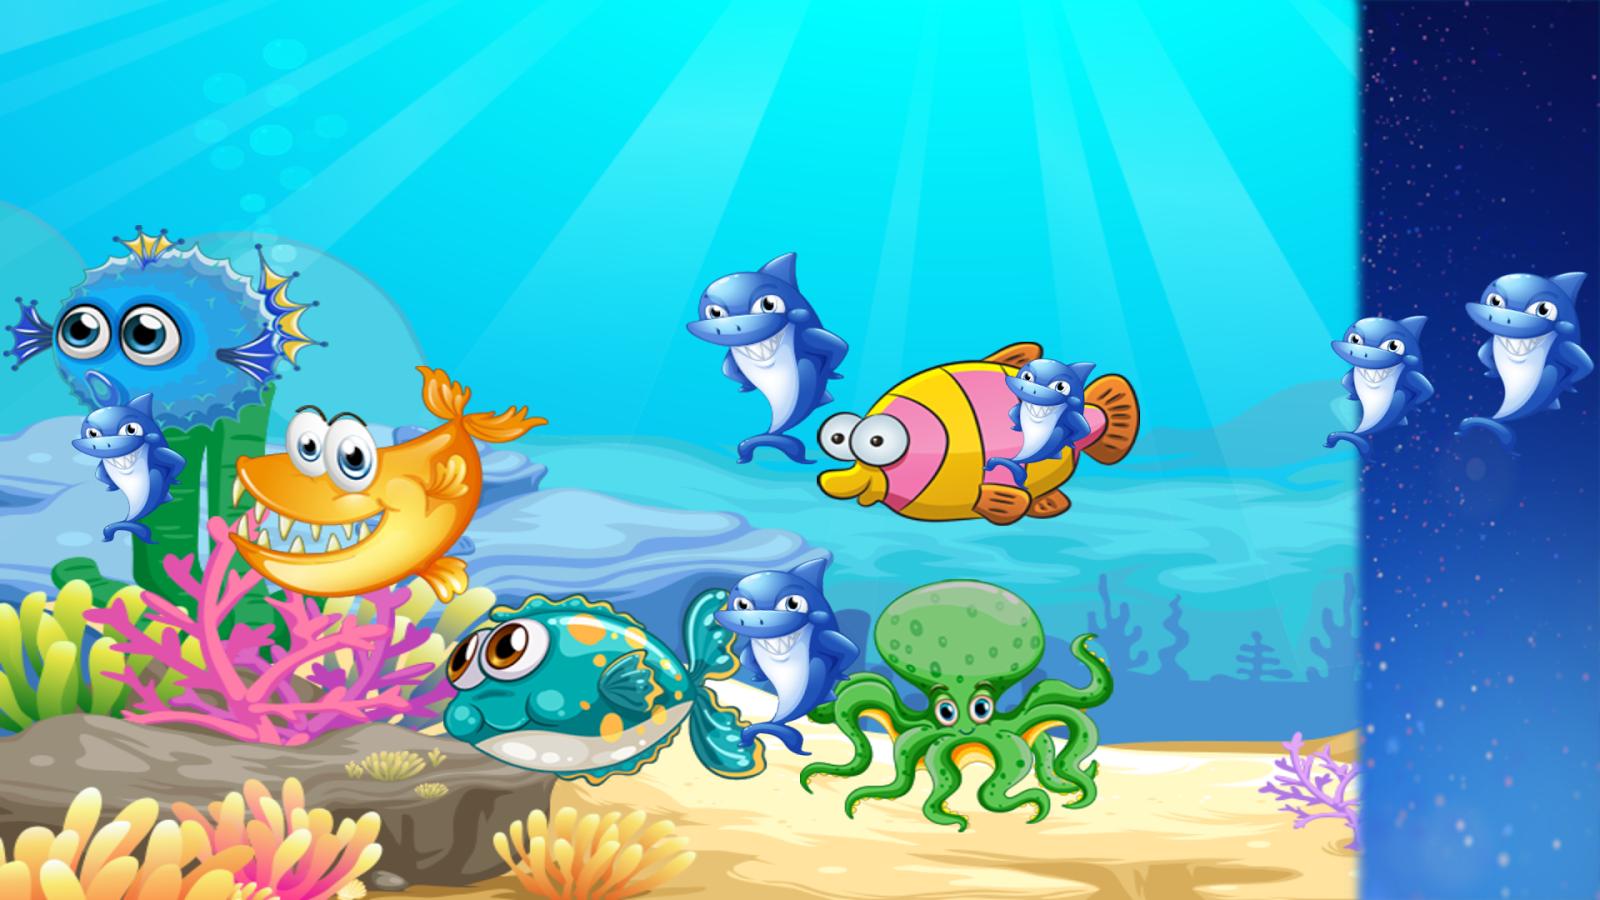 Gambar Ikan Kartun Berwarna